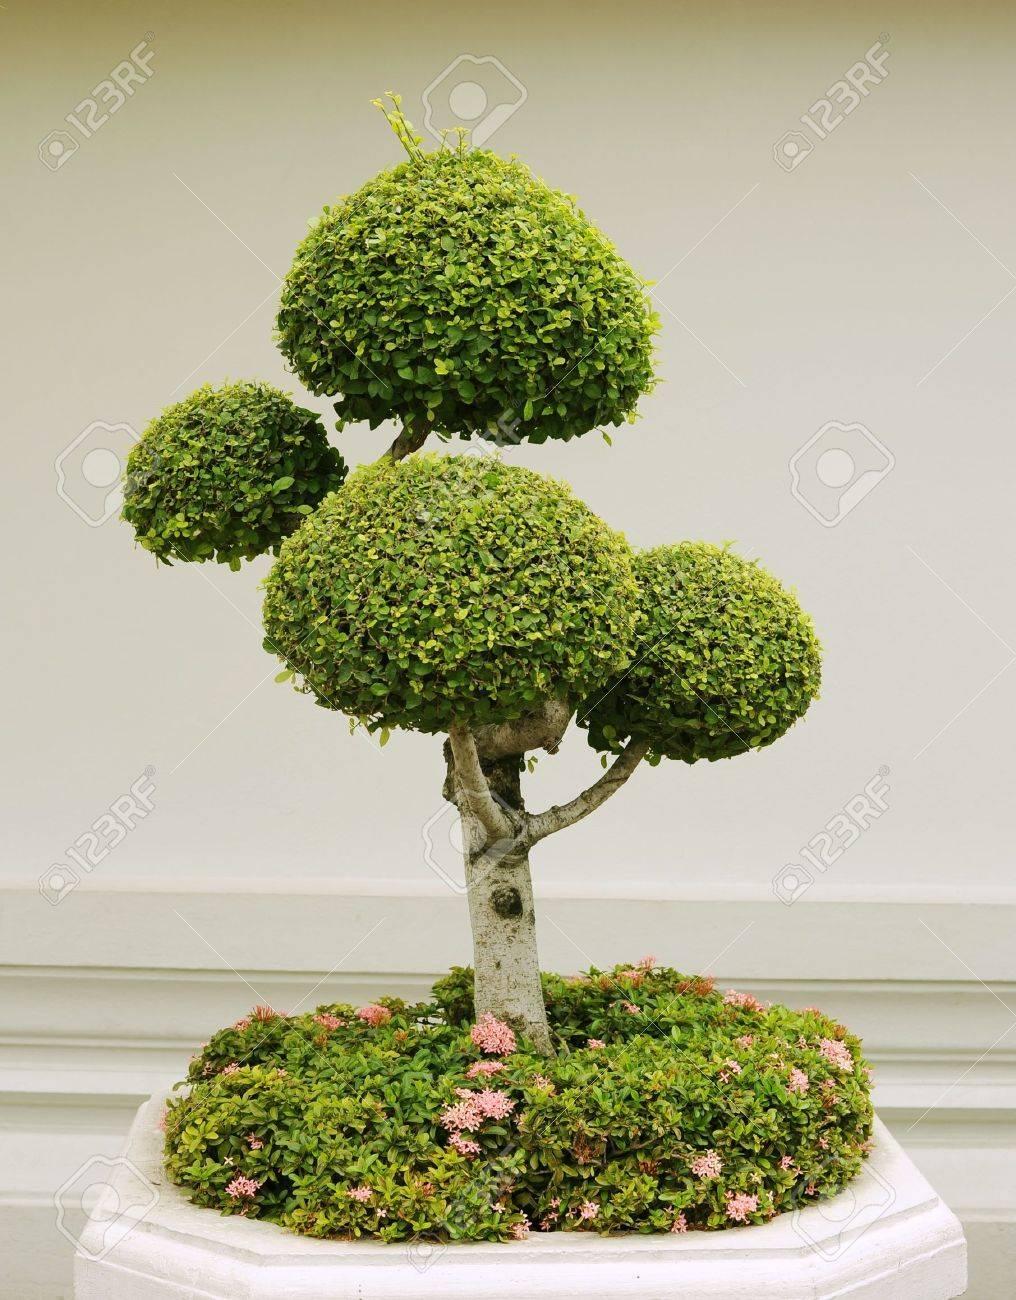 decorative shaped decor depositphotos photo crprin fancy stock tree